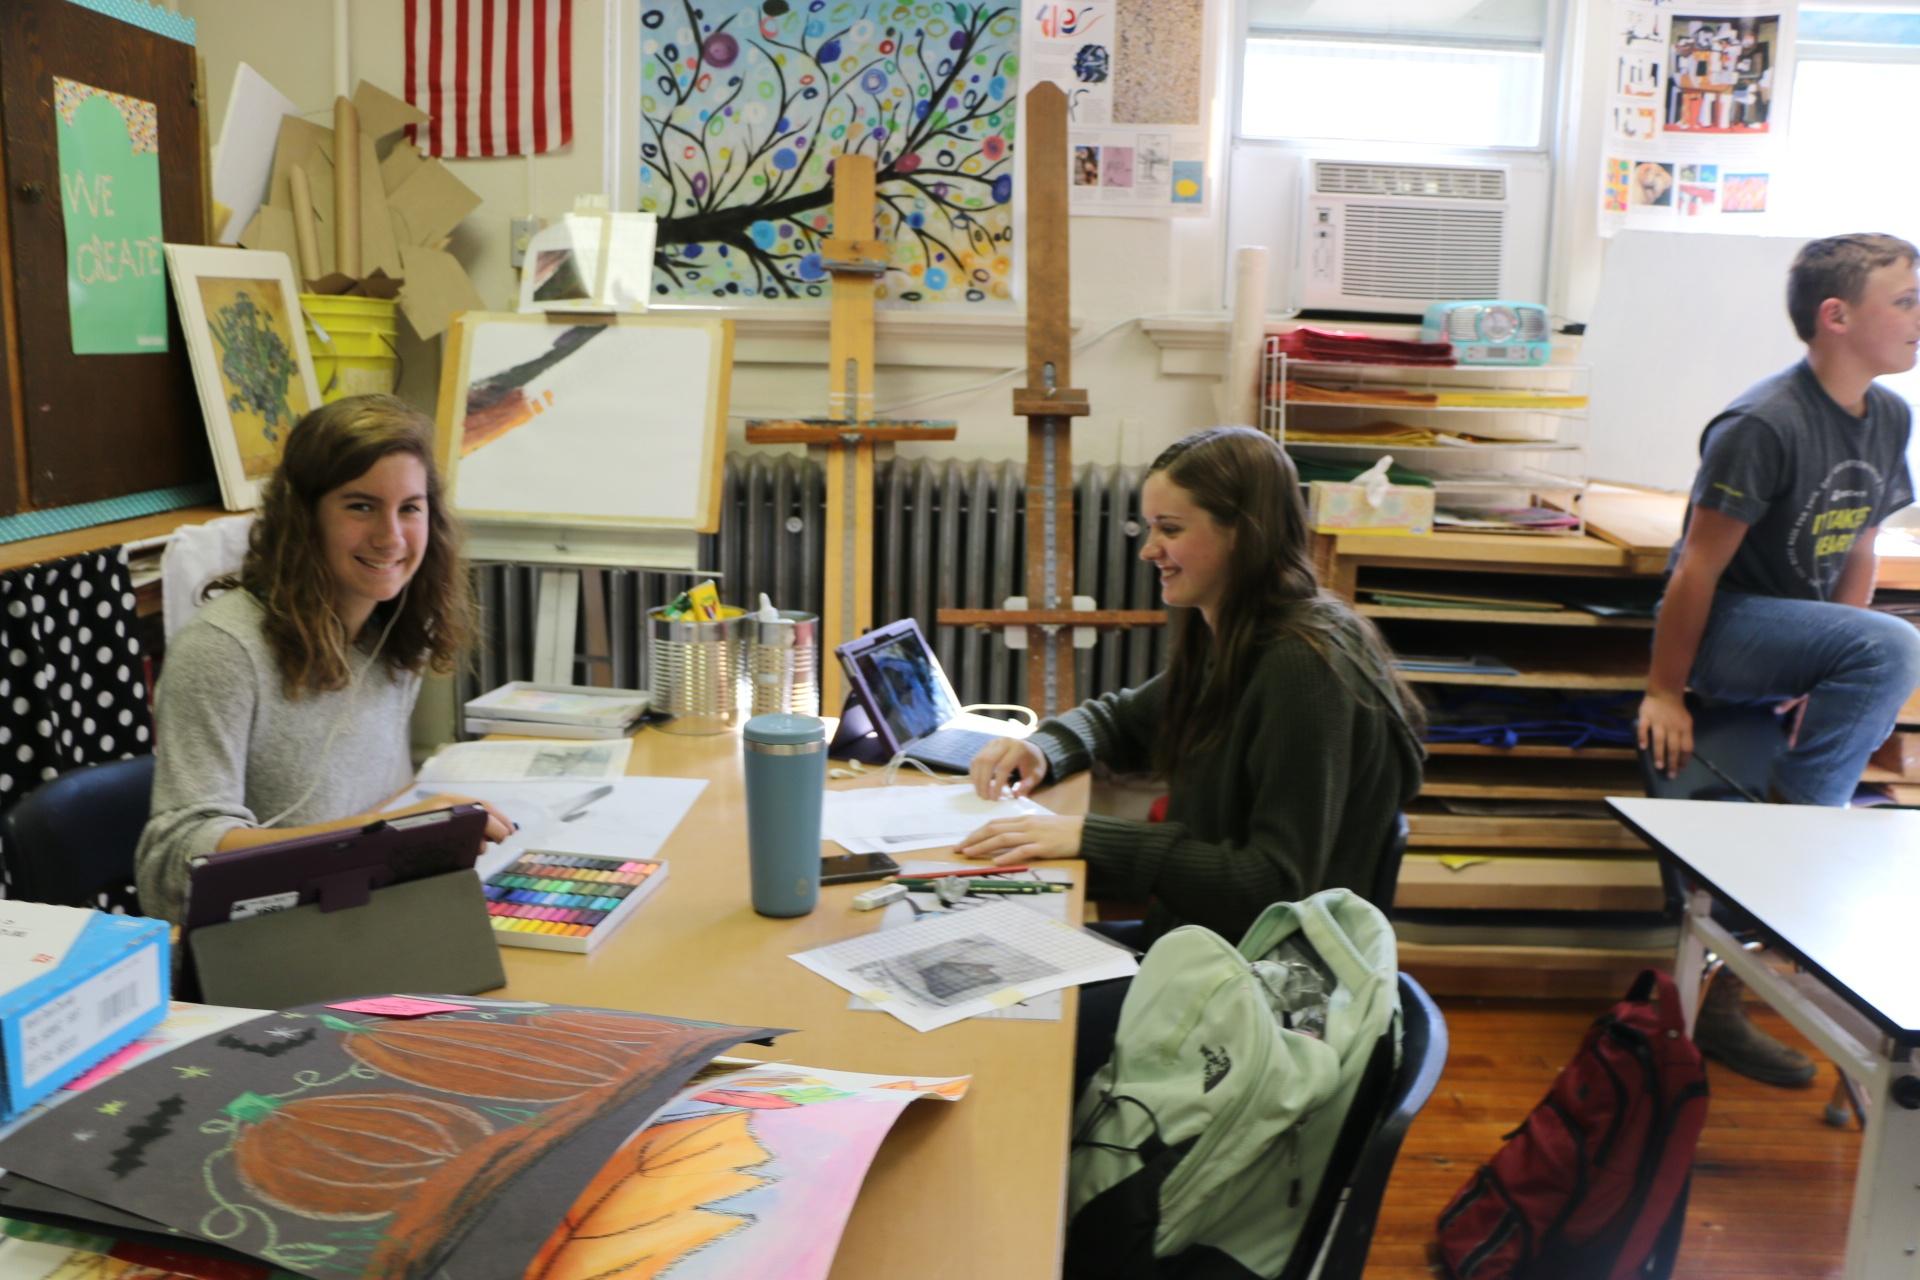 High School Art Kara Fehr and Jenna Montag